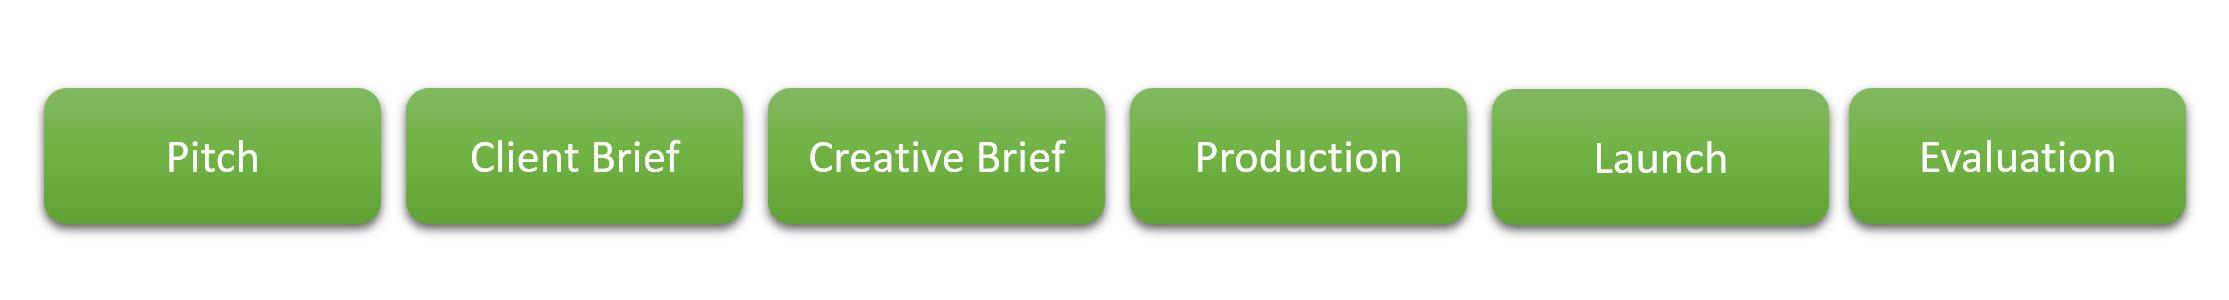 client-brief-2